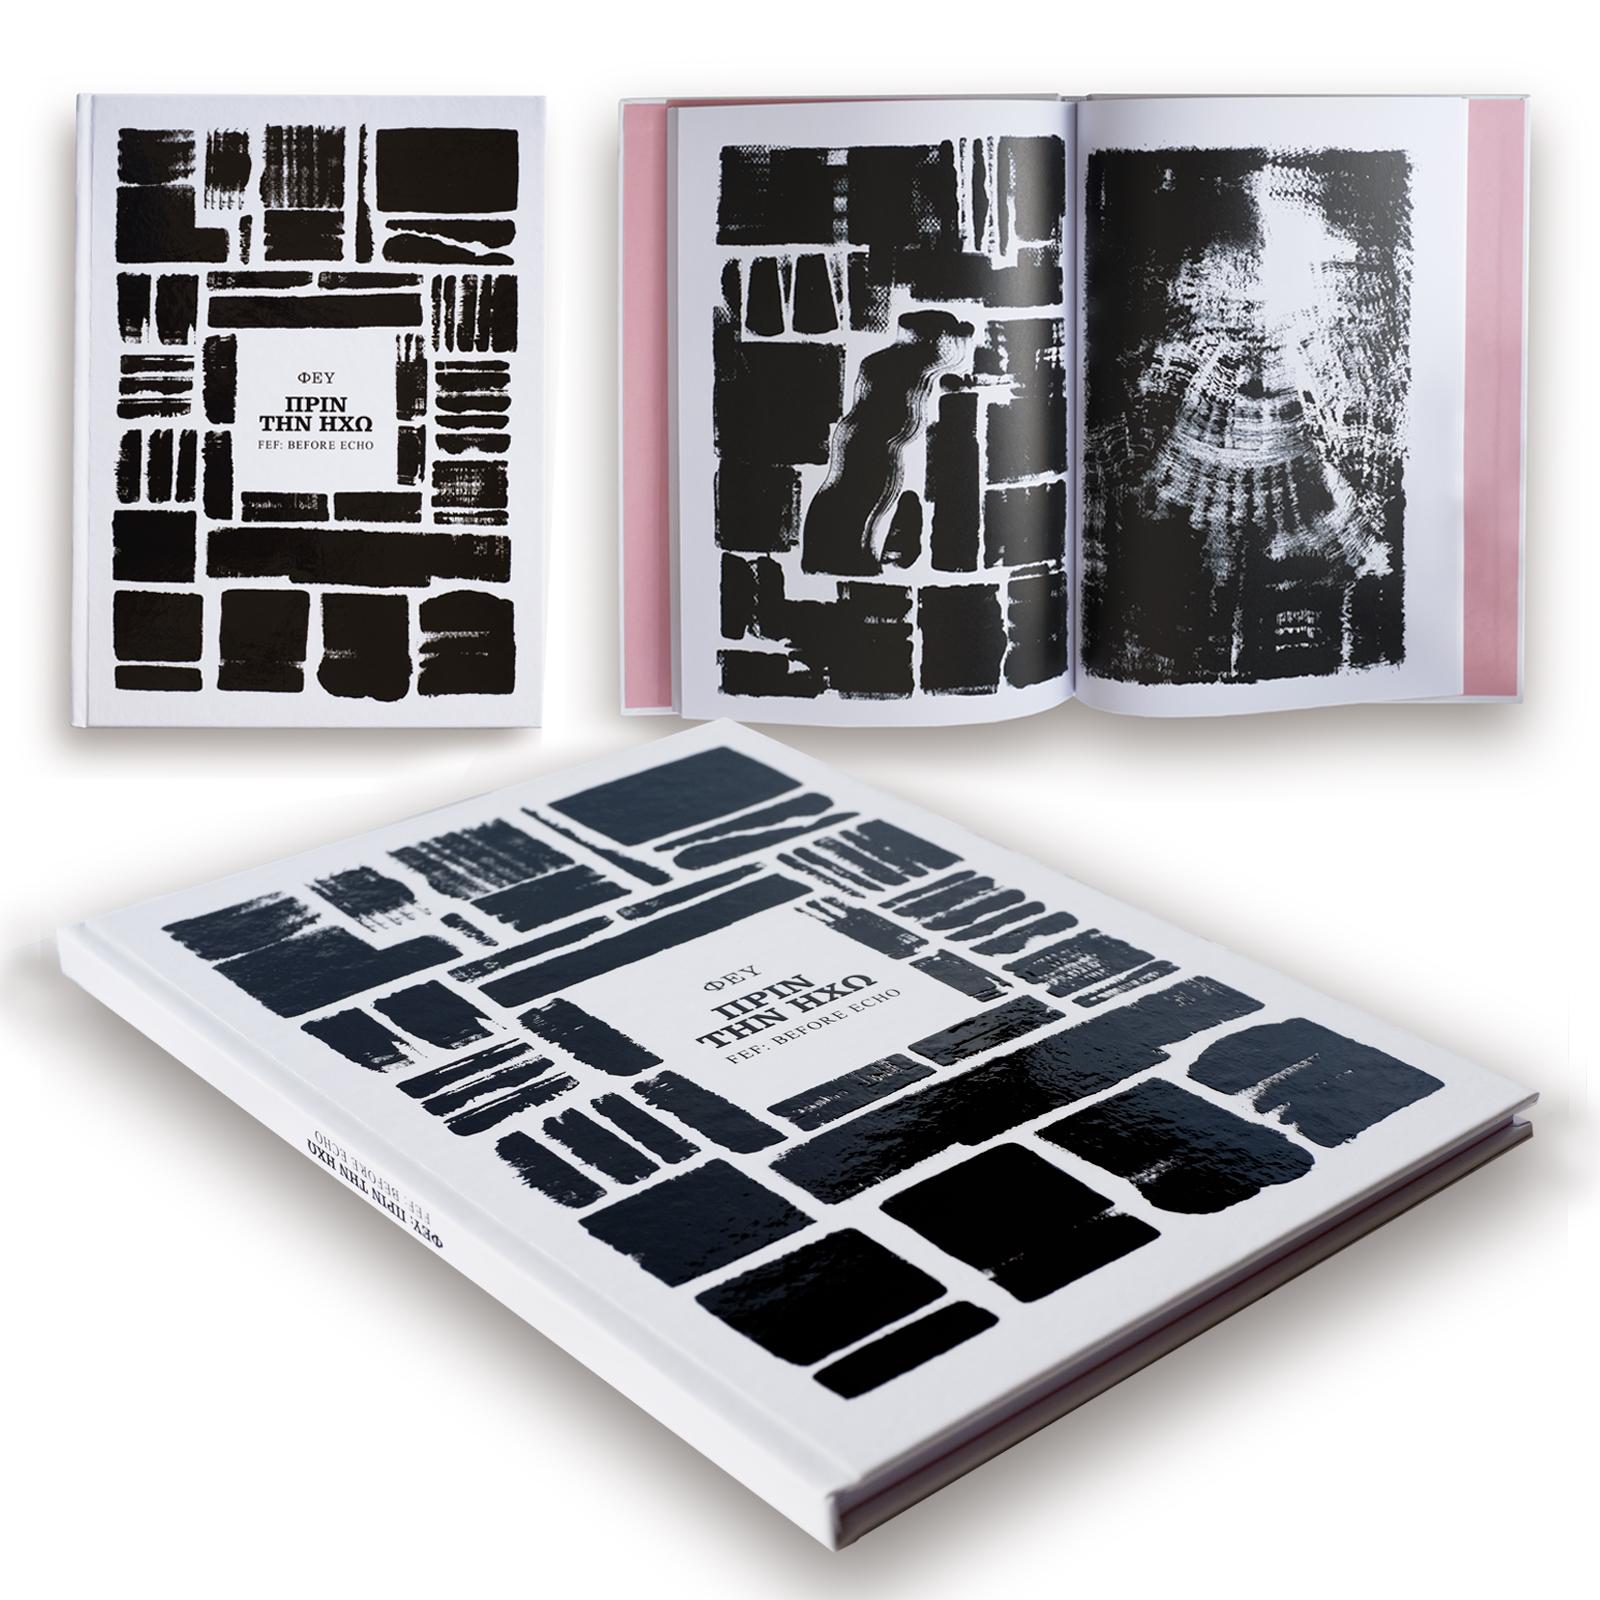 "FEF: Before Echo – Aristomenis Theodoropoulos Hardcover ISBN: 978-618-00-1051-0 SIZE: 21 x 28 cm (8.267"" x 11.023"") FINISHING: Hardback w. velvet paper & matte lamination INTERIOR: 72 Pages, B&W, printed on 140g X-Per paper LANGUAGE: Greek / English Limited edition of 111 hand-numbered copies    PURCHASE    ΦΕΥ: Πριν την Ηχώ – Αριστομένης Θεοδωρόπουλος Σκληρόδετο ISBN: 978-618-00-1051-0 ΔΙΑΣΤΑΣΕΙΣ: 21 x 28 cm ΕΠΕΝΔΥΣΗ: Χαρτονόδετο σε βέλβετ χαρτί & πλαστικοποίηση ματ Εσωτερικό: 72 Σελίδες, ασπρόμαυρες, τυπωμένες σε X-Per χαρτί 149g ΓΛΩΣΣΑ: Ελληνικά / Αγγλικά Περιορισμένη έκδοση 111 αντιτύπων, αριθμημένα στο χέρι.    ΑΓΟΡΑ"